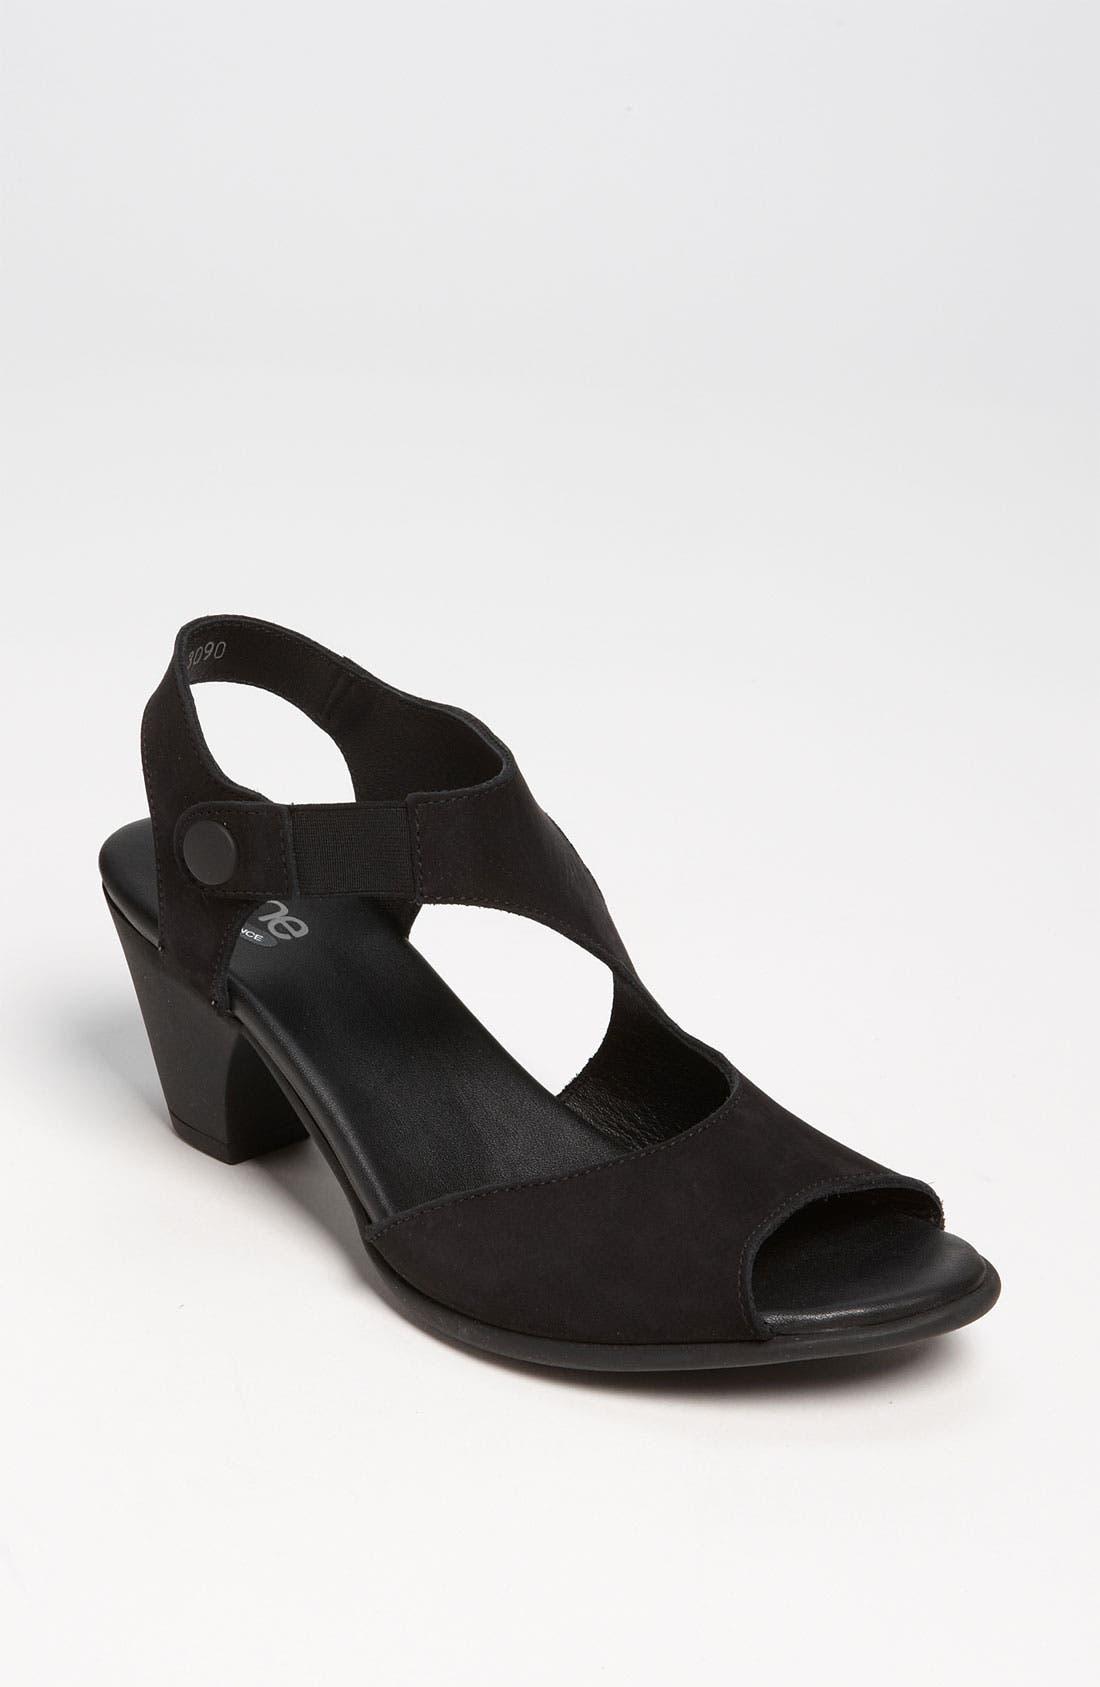 Main Image - Arche 'Mityal' Sandal